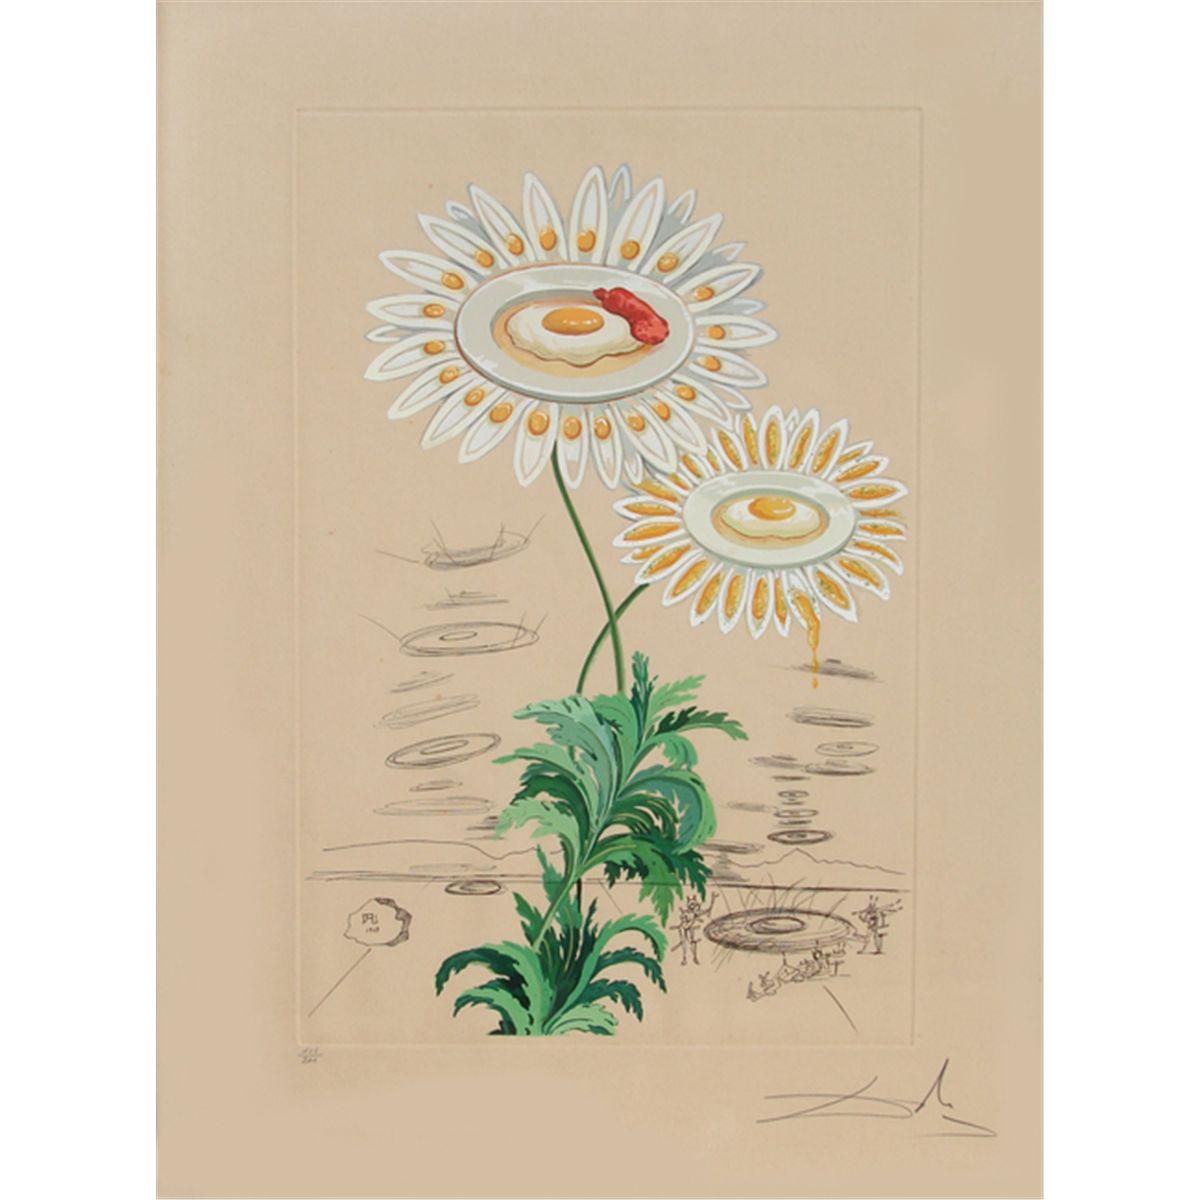 Salvador Dali, Chrysanthemum Frutescens, Photolithograph Engraving